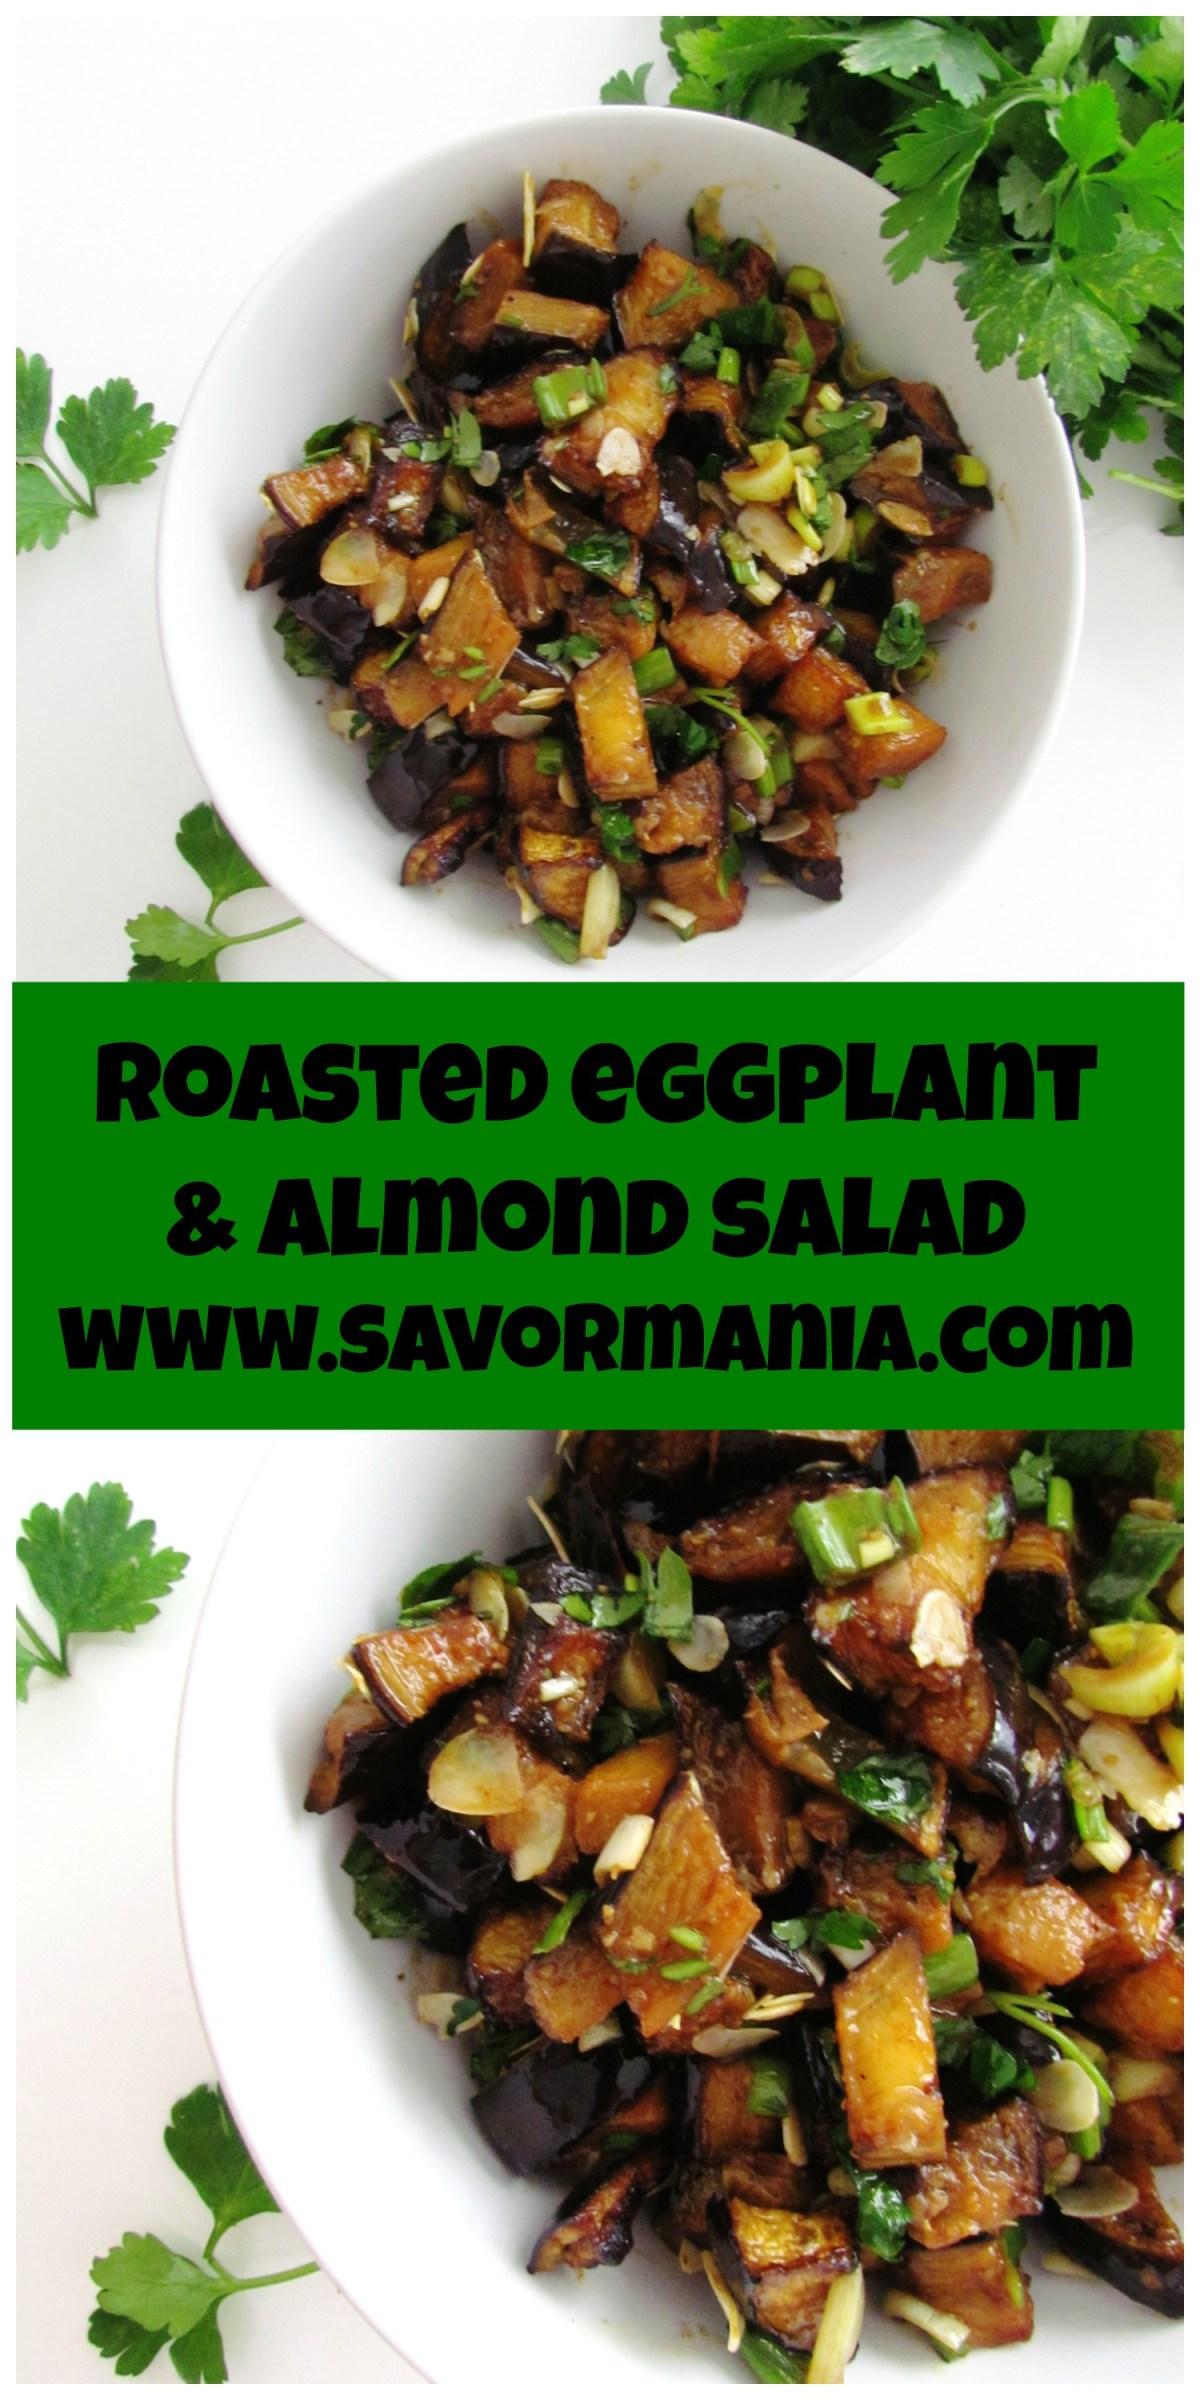 roasted eggplant almond salad | www.savormania.com